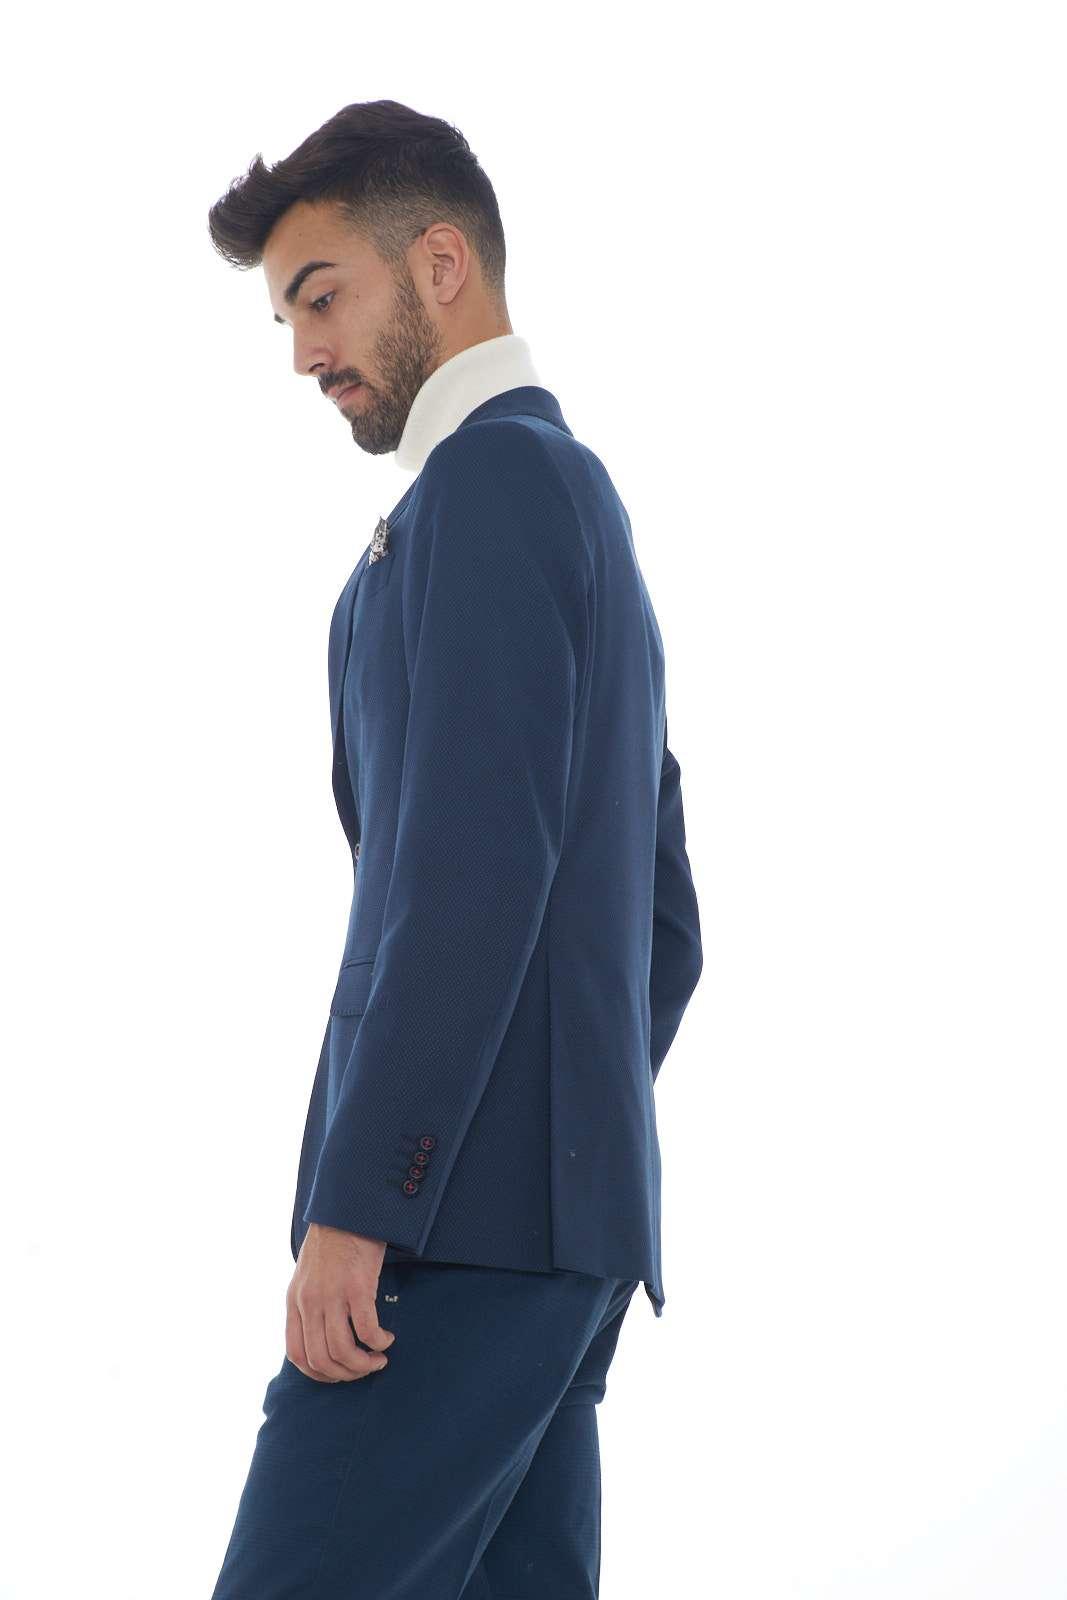 https://www.parmax.com/media/catalog/product/a/i/AI-outlet_parmax-giacca-uomo-Manuel-Ritz-2732G2068%20193534-B.jpg